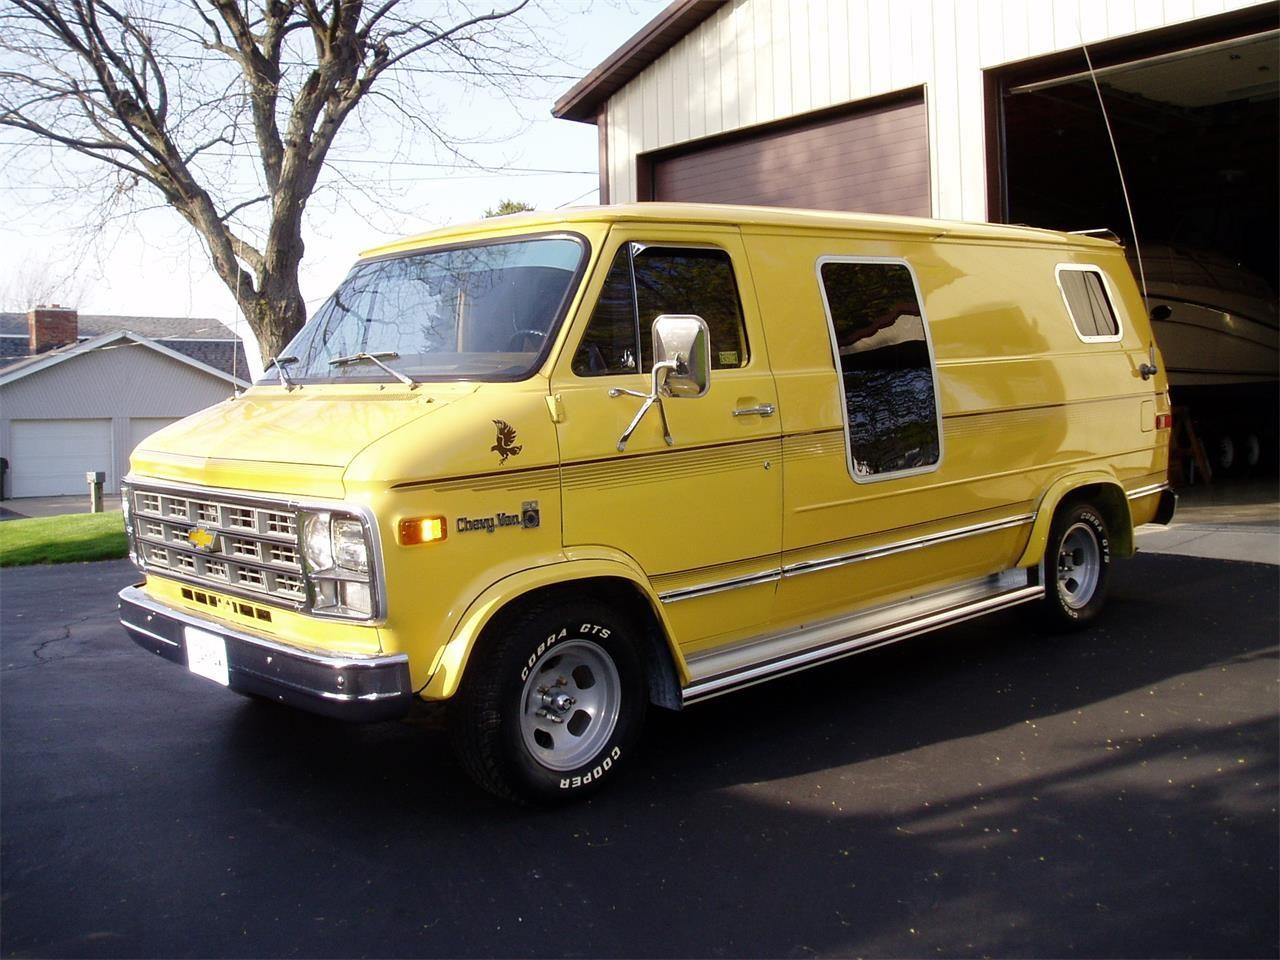 240b89ecb9 1978 Chevrolet G20 for Sale - CC-882497